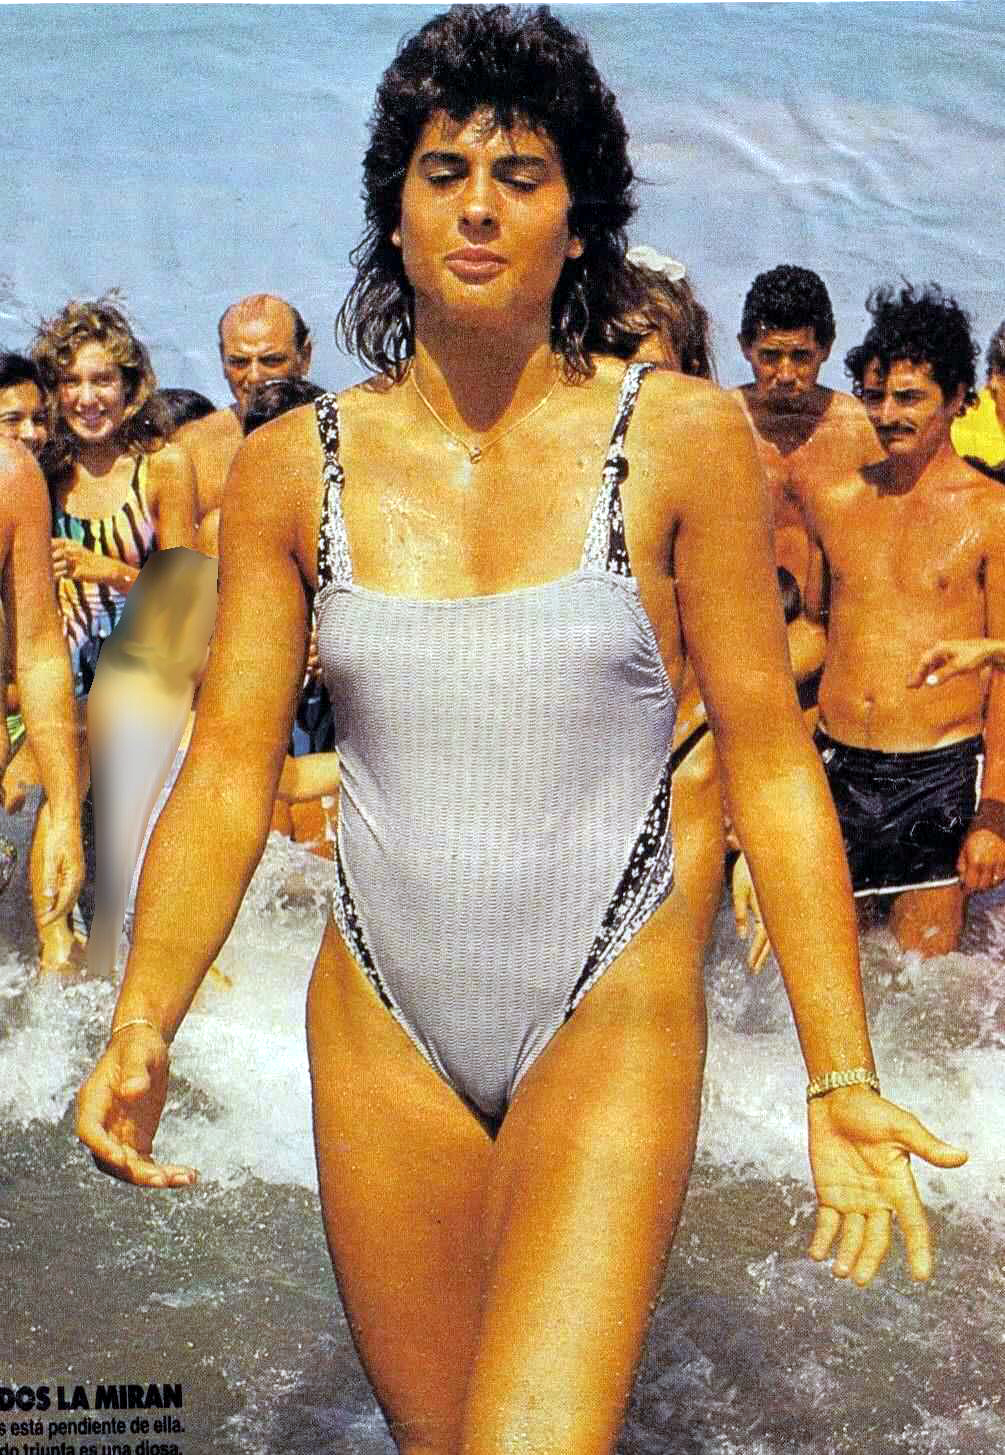 Adriana aguirre encuentros muy cercanos 1978 4